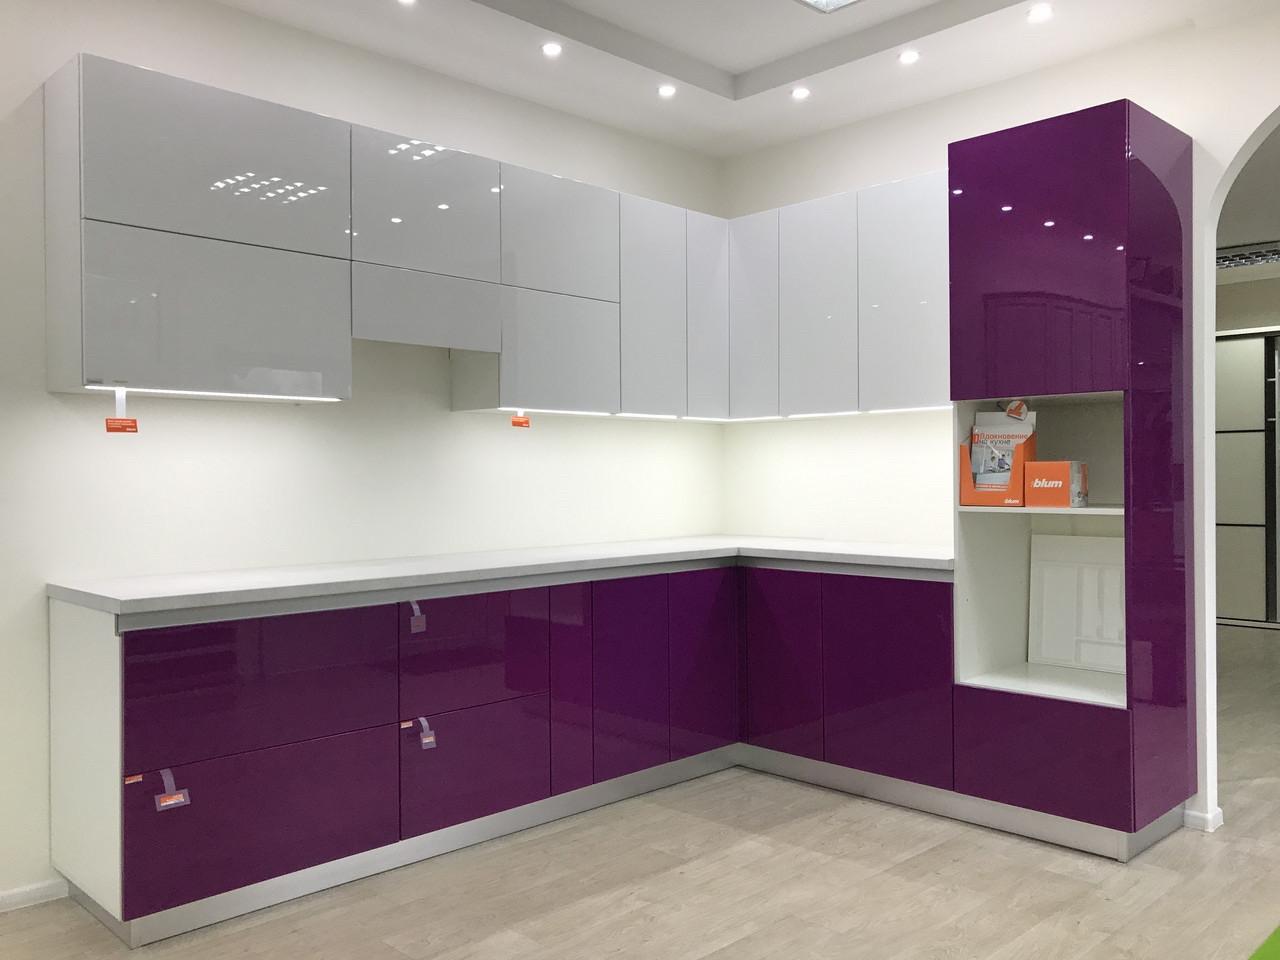 Кухня на заказ с фиолетовыми фасадами BLUM-333